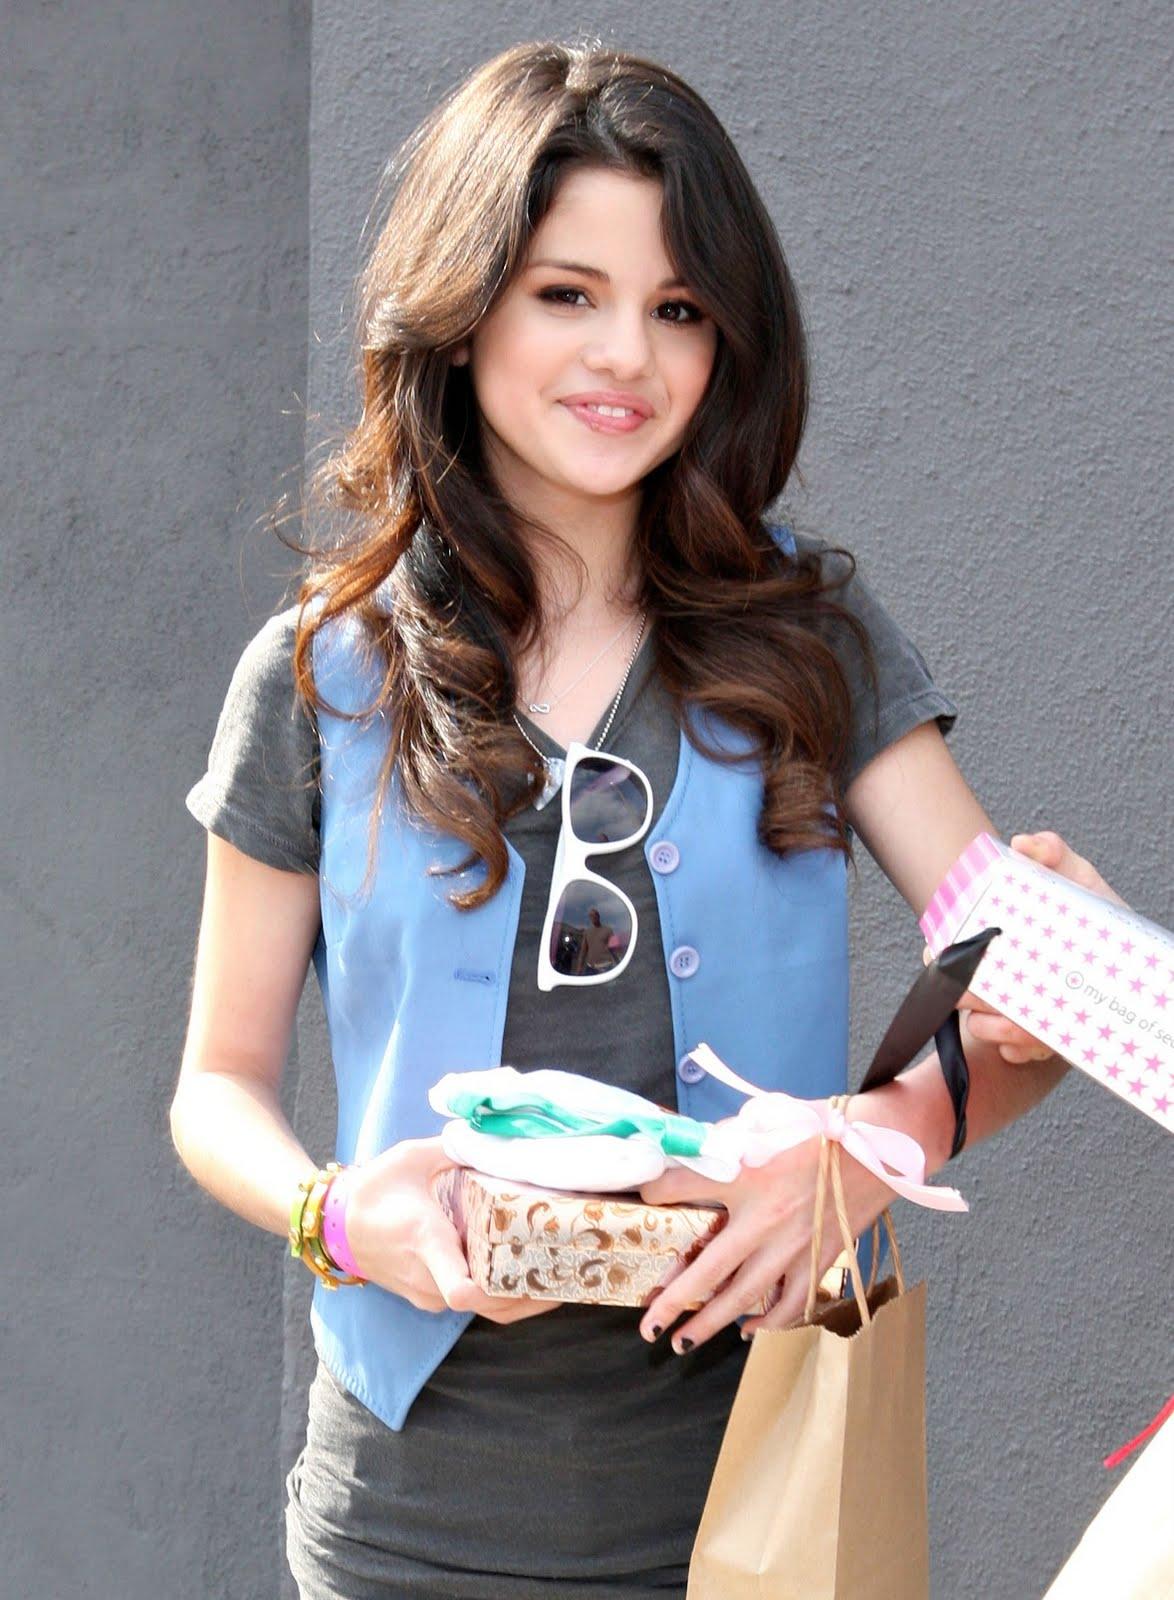 http://3.bp.blogspot.com/-V8mxjMjmaPs/TcWzlNq9P9I/AAAAAAAADYg/tnivlME7gBI/s1600/Selena+Gomez+hot+stills.jpg